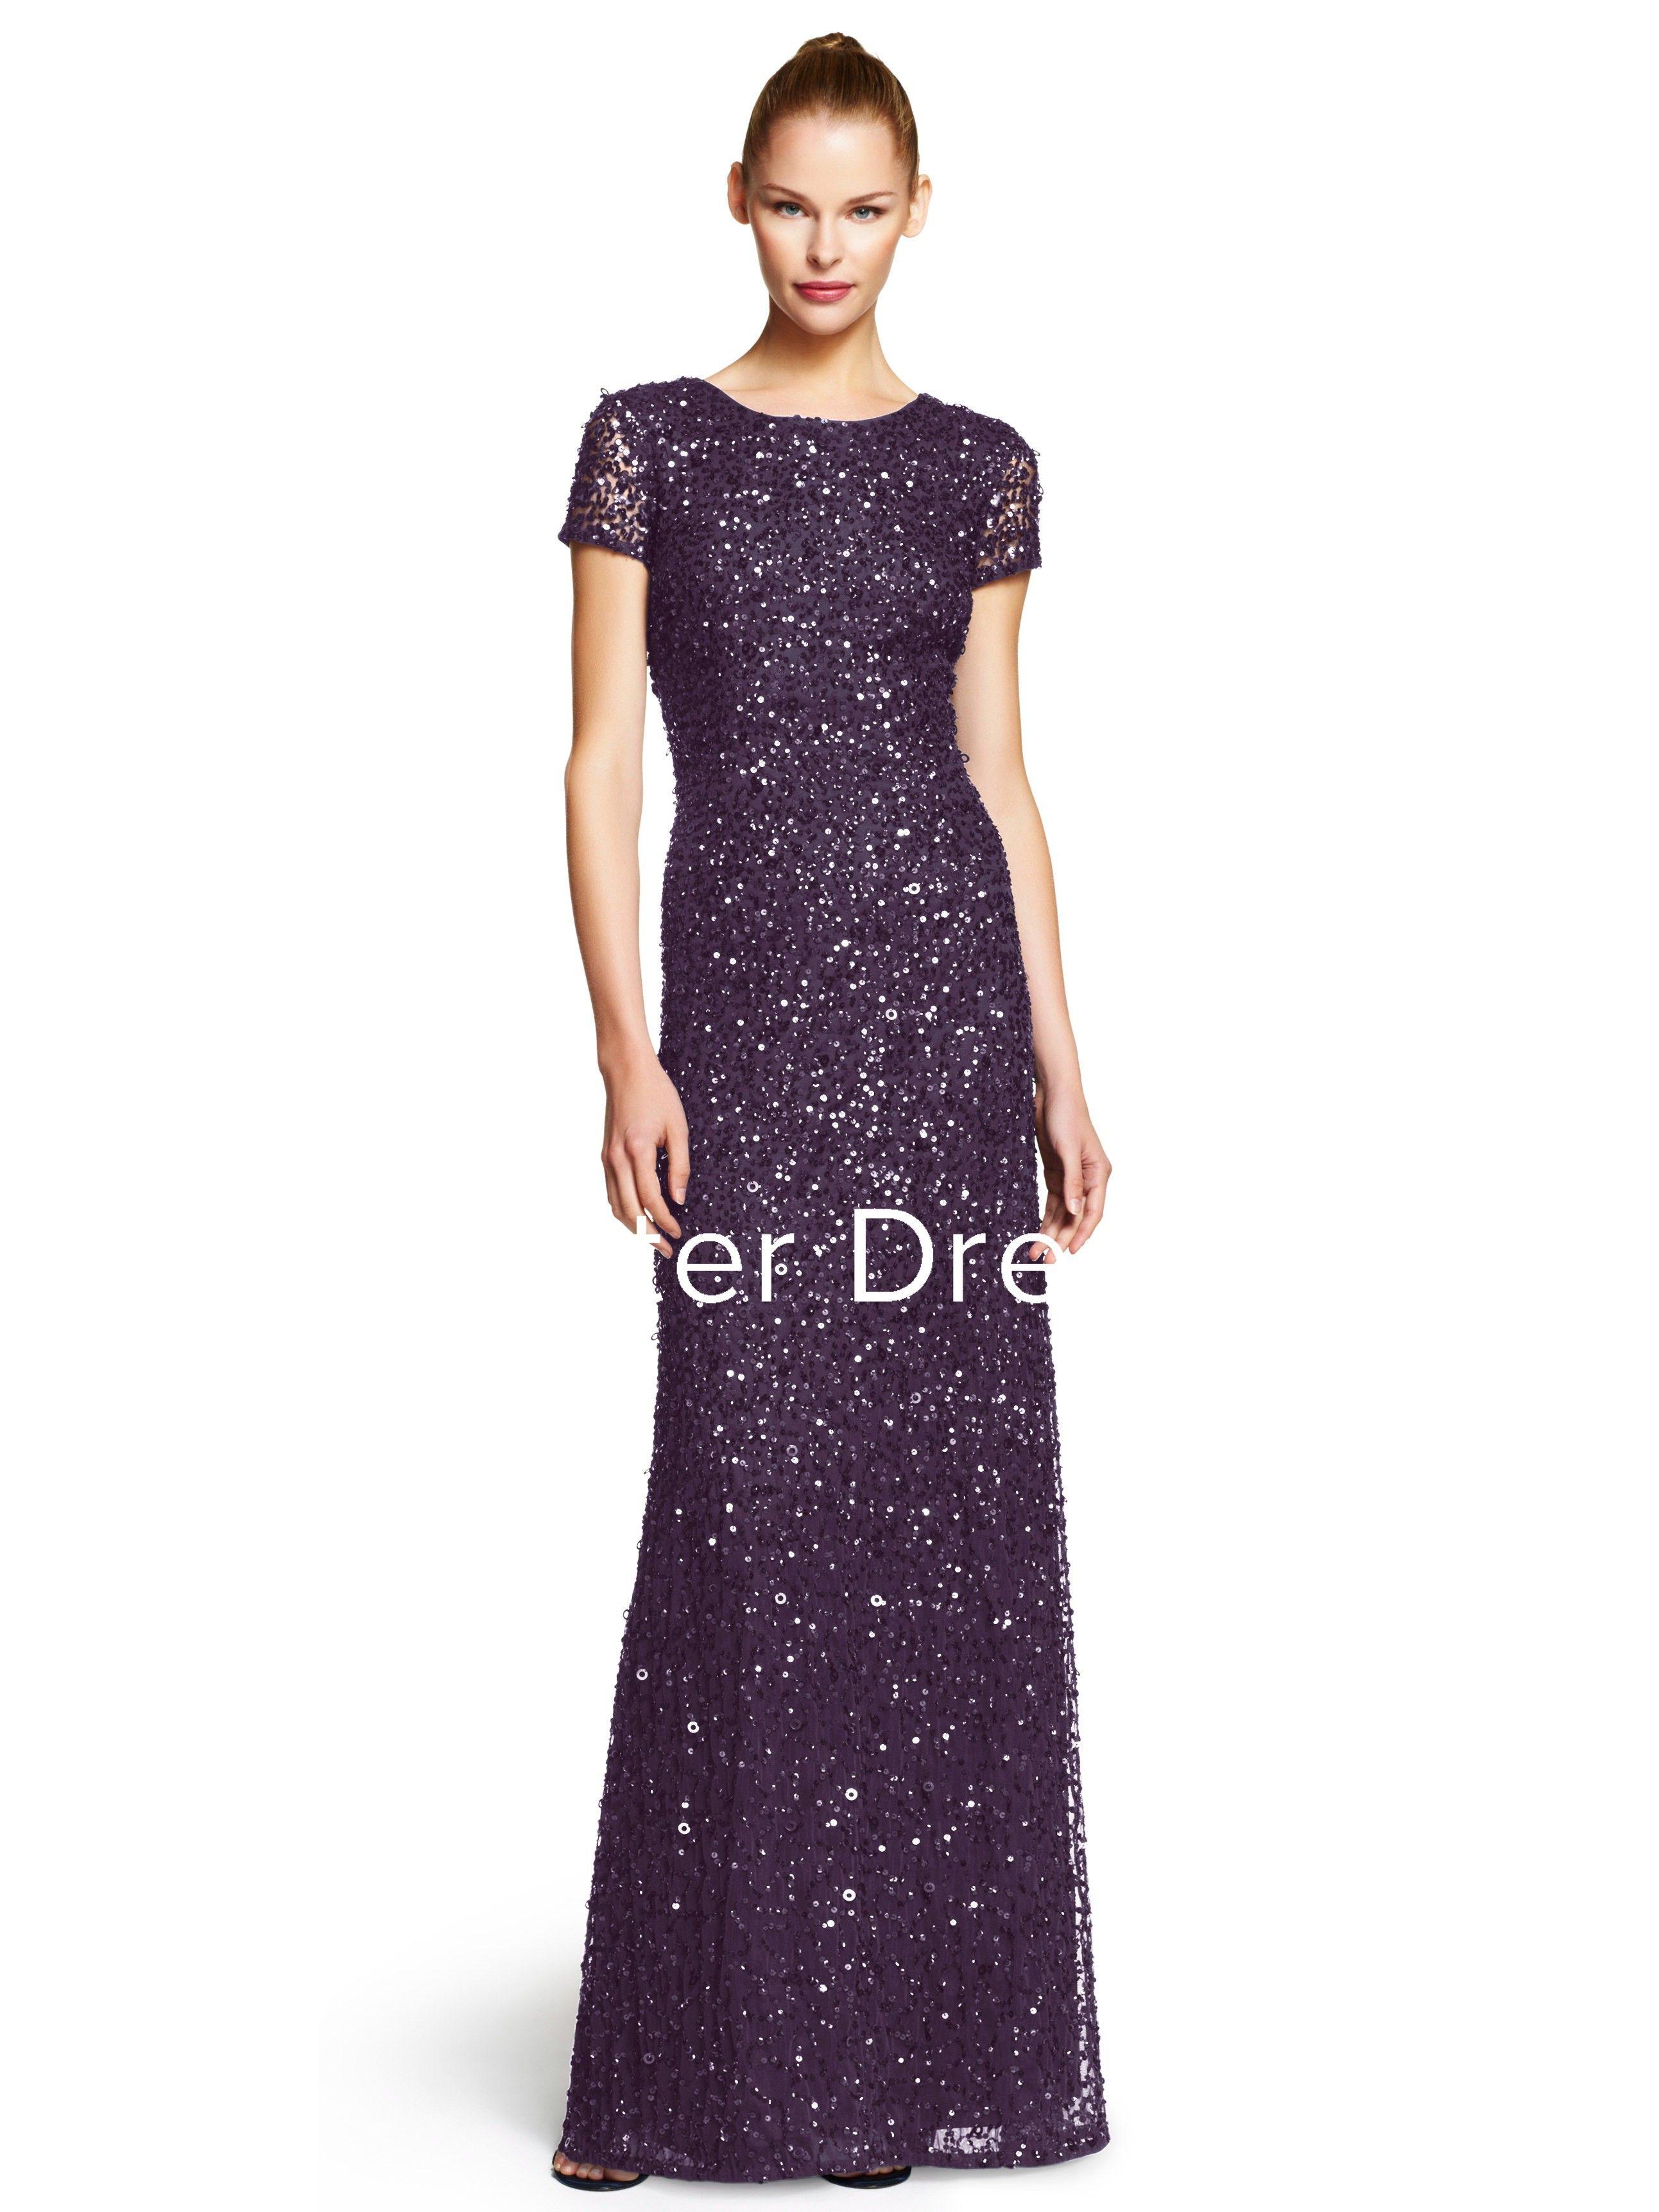 Sheath scoopneck shortsleeve sequins bridesmaid dress pinterest